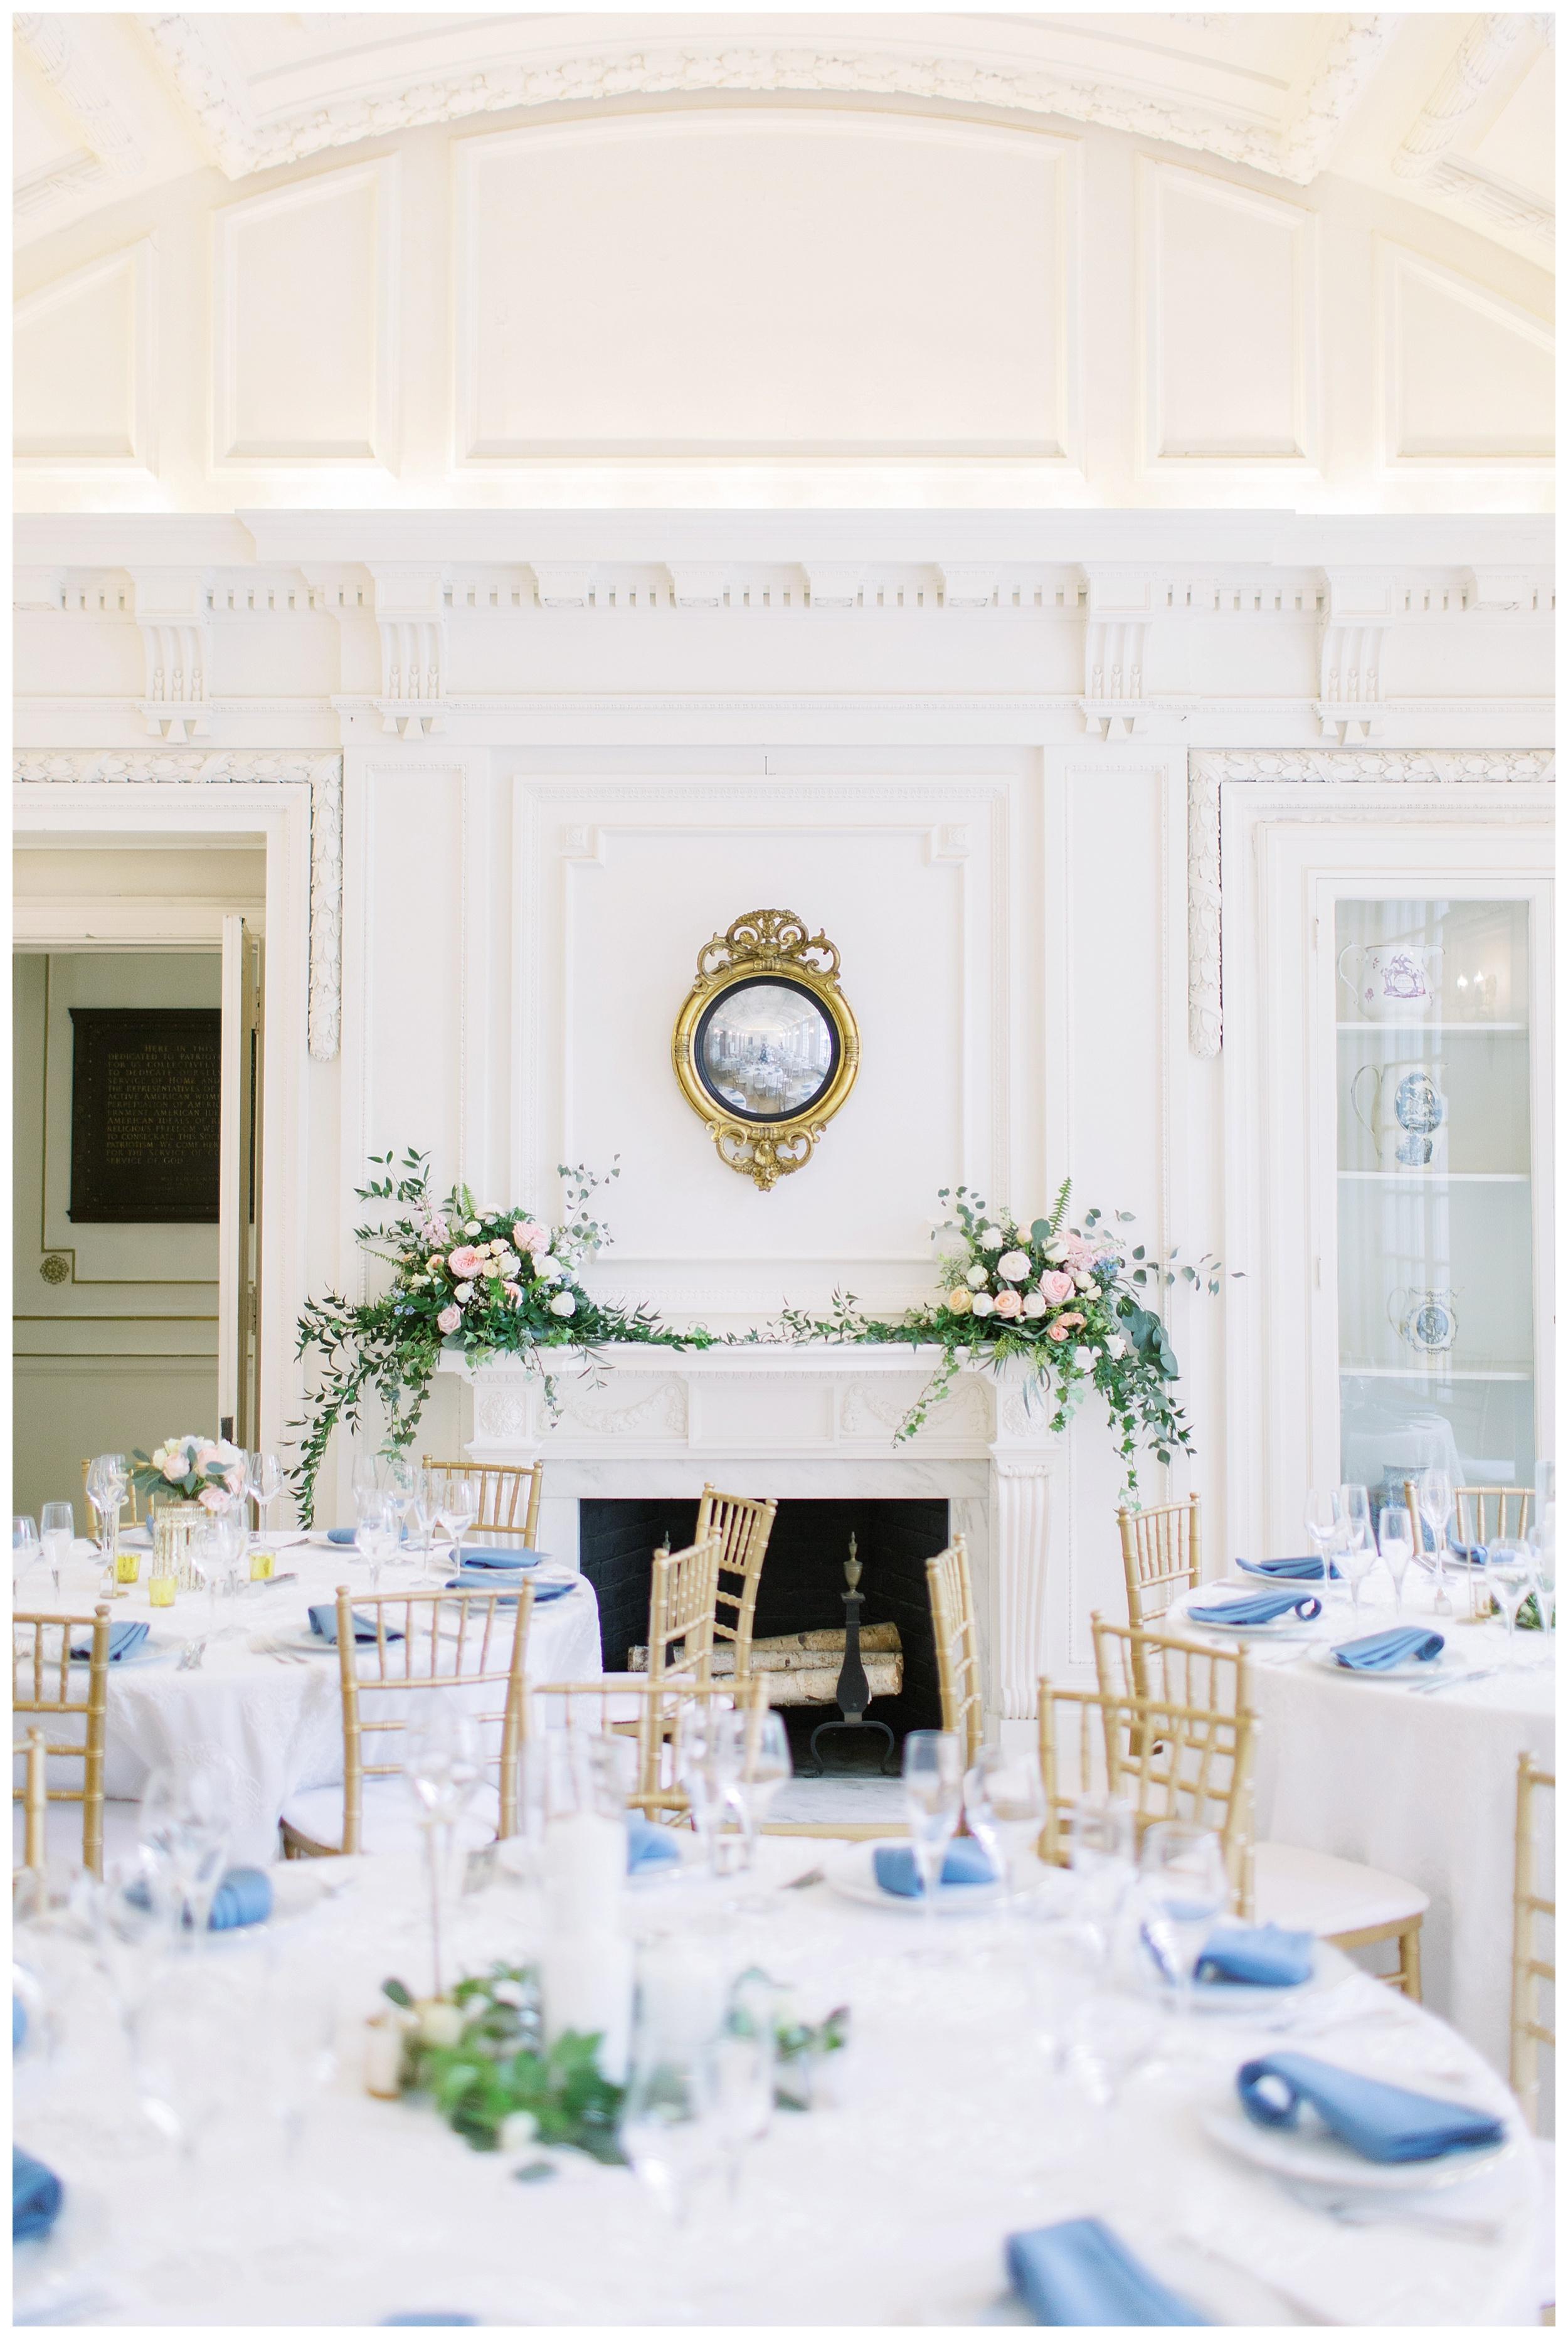 DAR Constitution Hall Wedding Wedding | Daughters of the American Revolution Wedding | District of Columbia Film Wedding Photographer Kir Tuben_0126.jpg